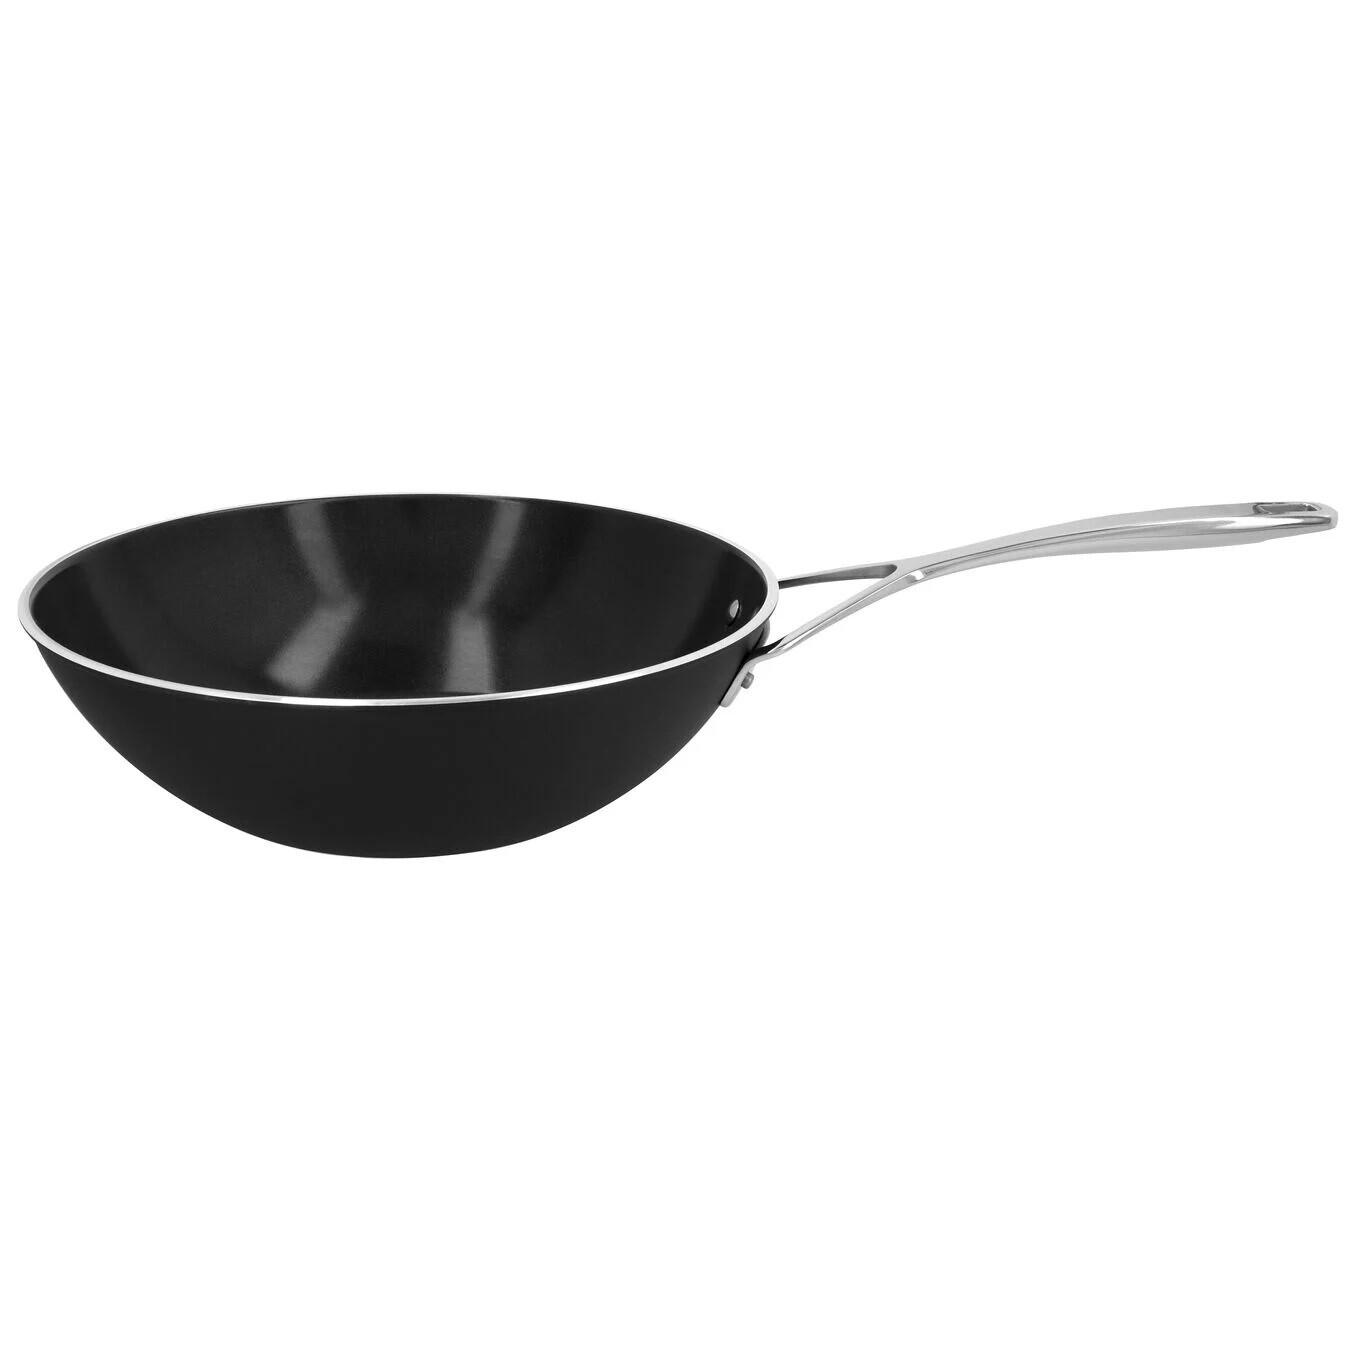 DEMEYERE 'alu pro 5 ceraforce' keramische antikleef wok 30cm  PROMO 99,00 -20%